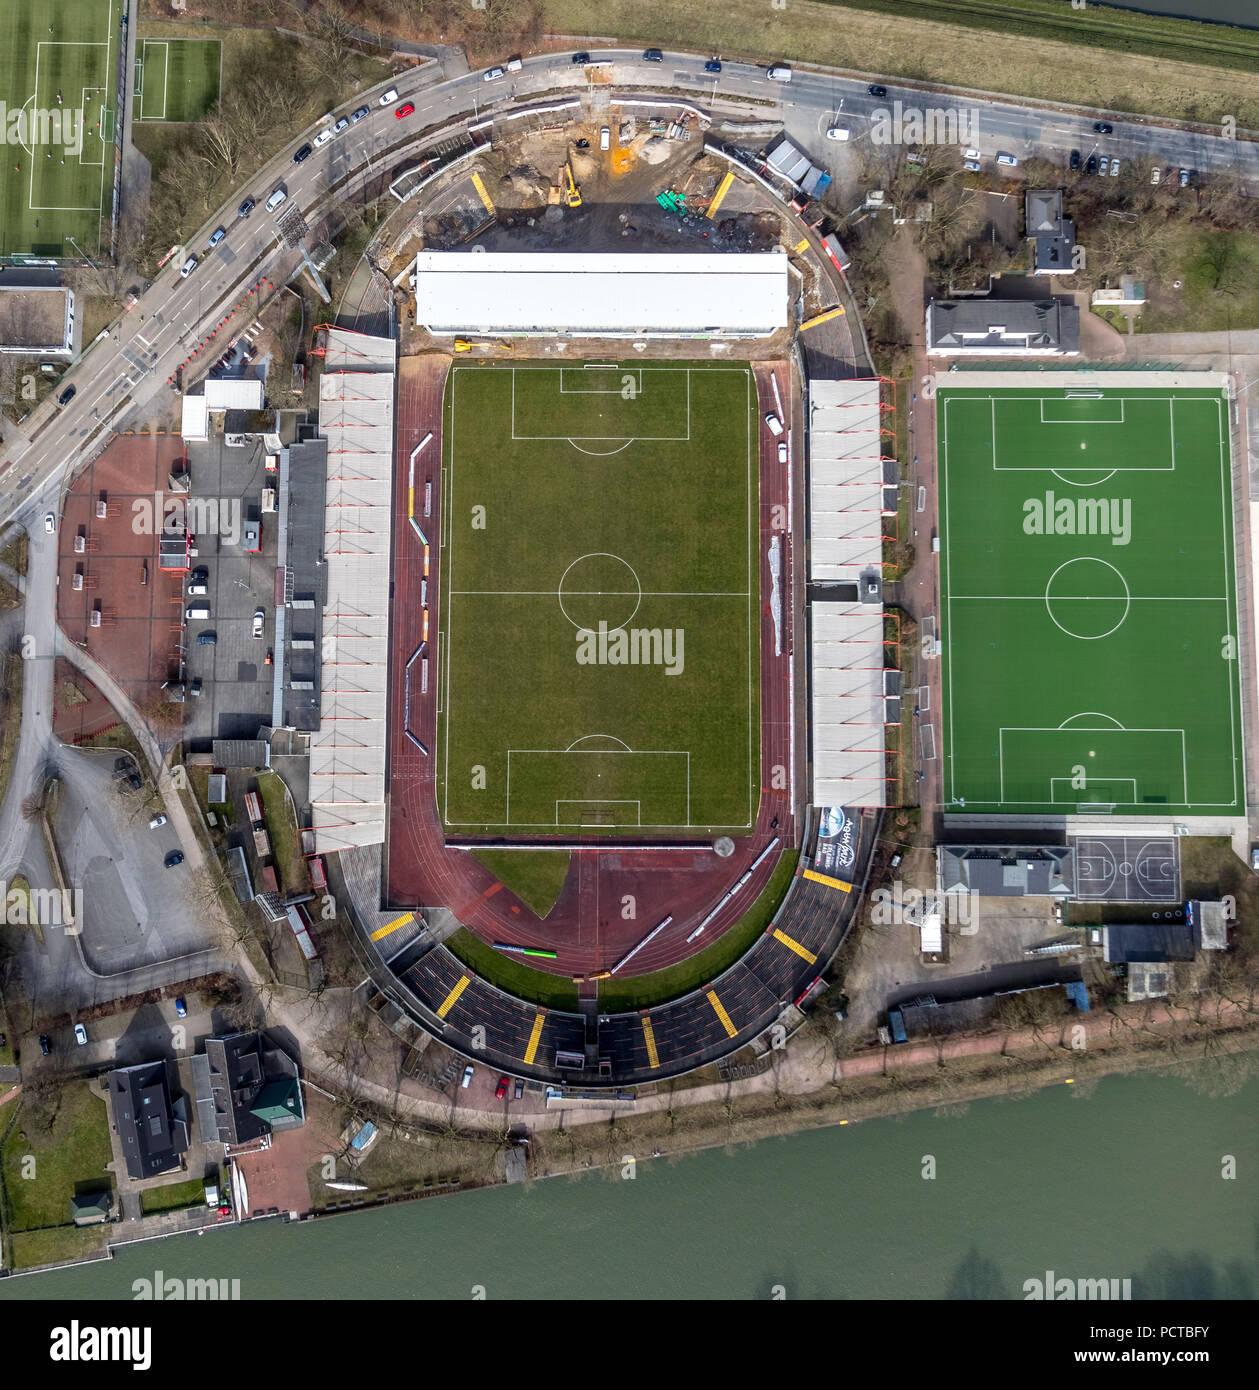 RWO Stadium Niederrhein, Lindnerstraße with new grandstand in Oberhausen, Ruhr area, North Rhine-Westphalia, Germany - Stock Image